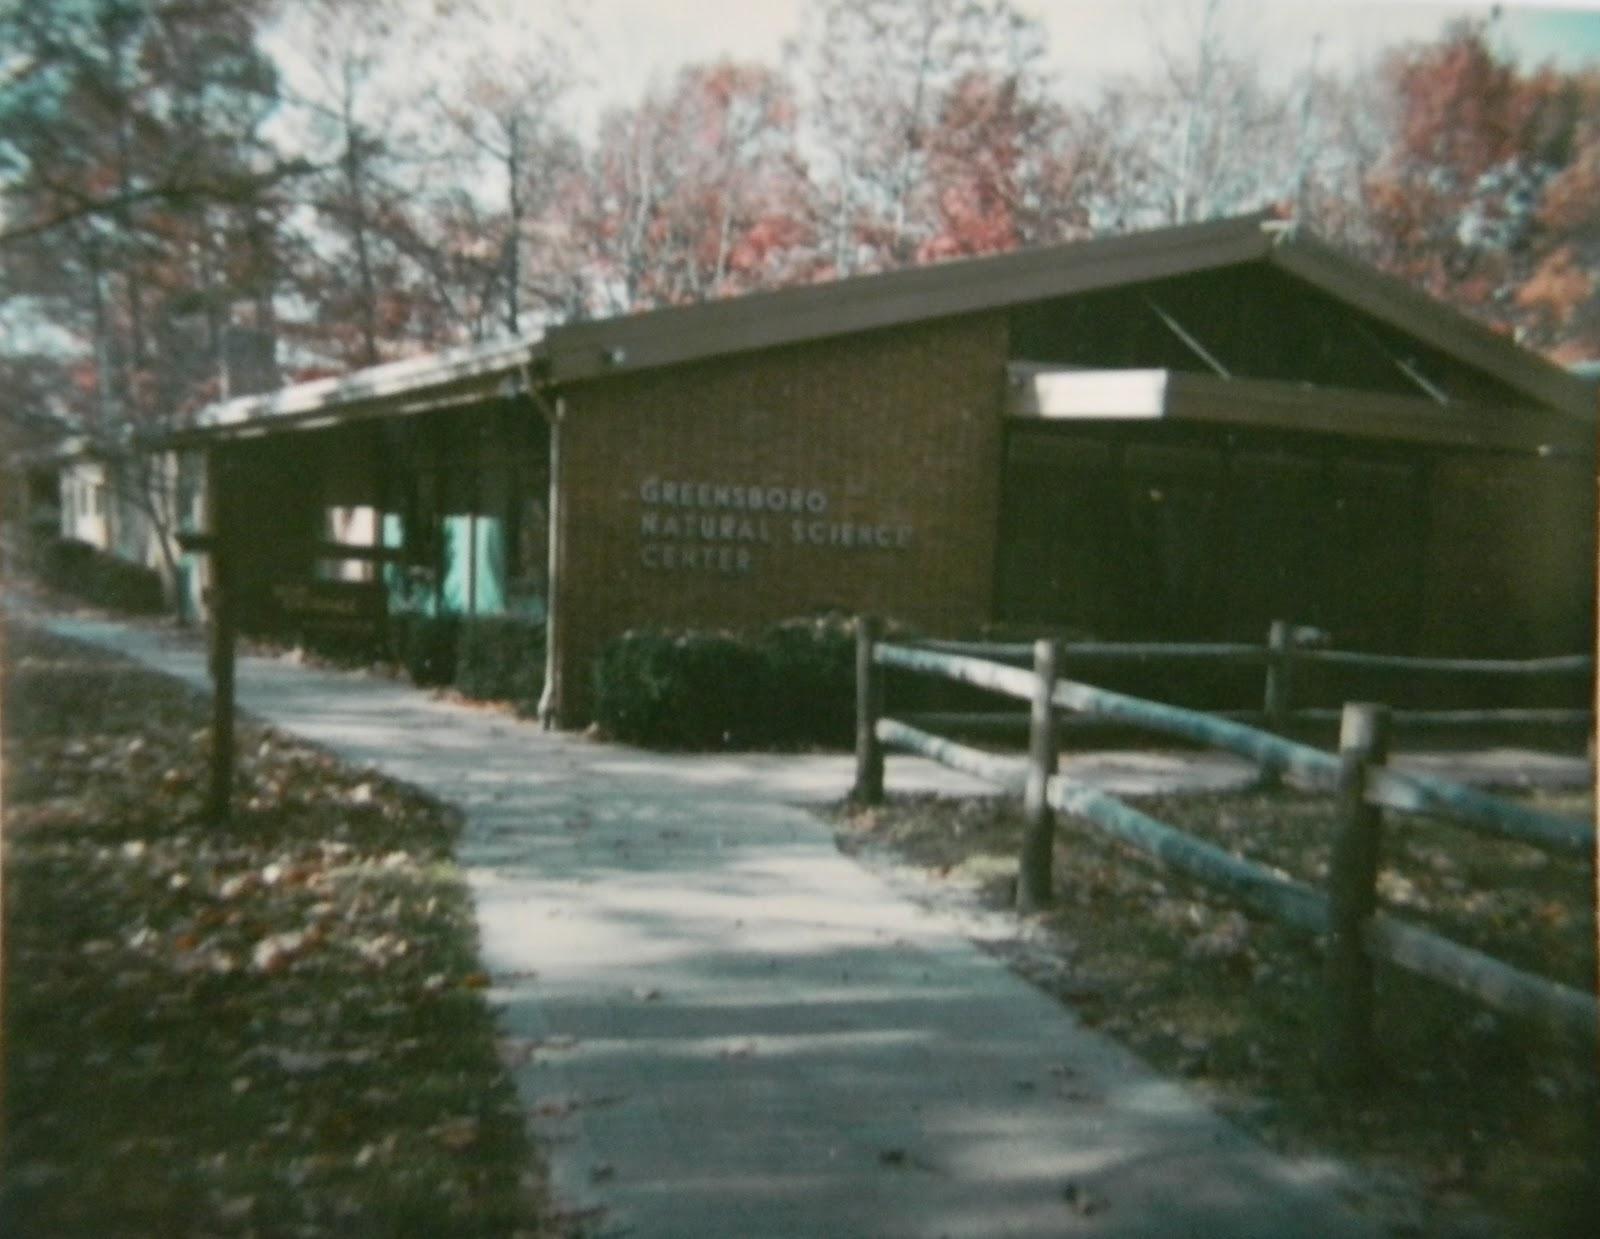 Natural Science Center Greensboro Nc Volunteer